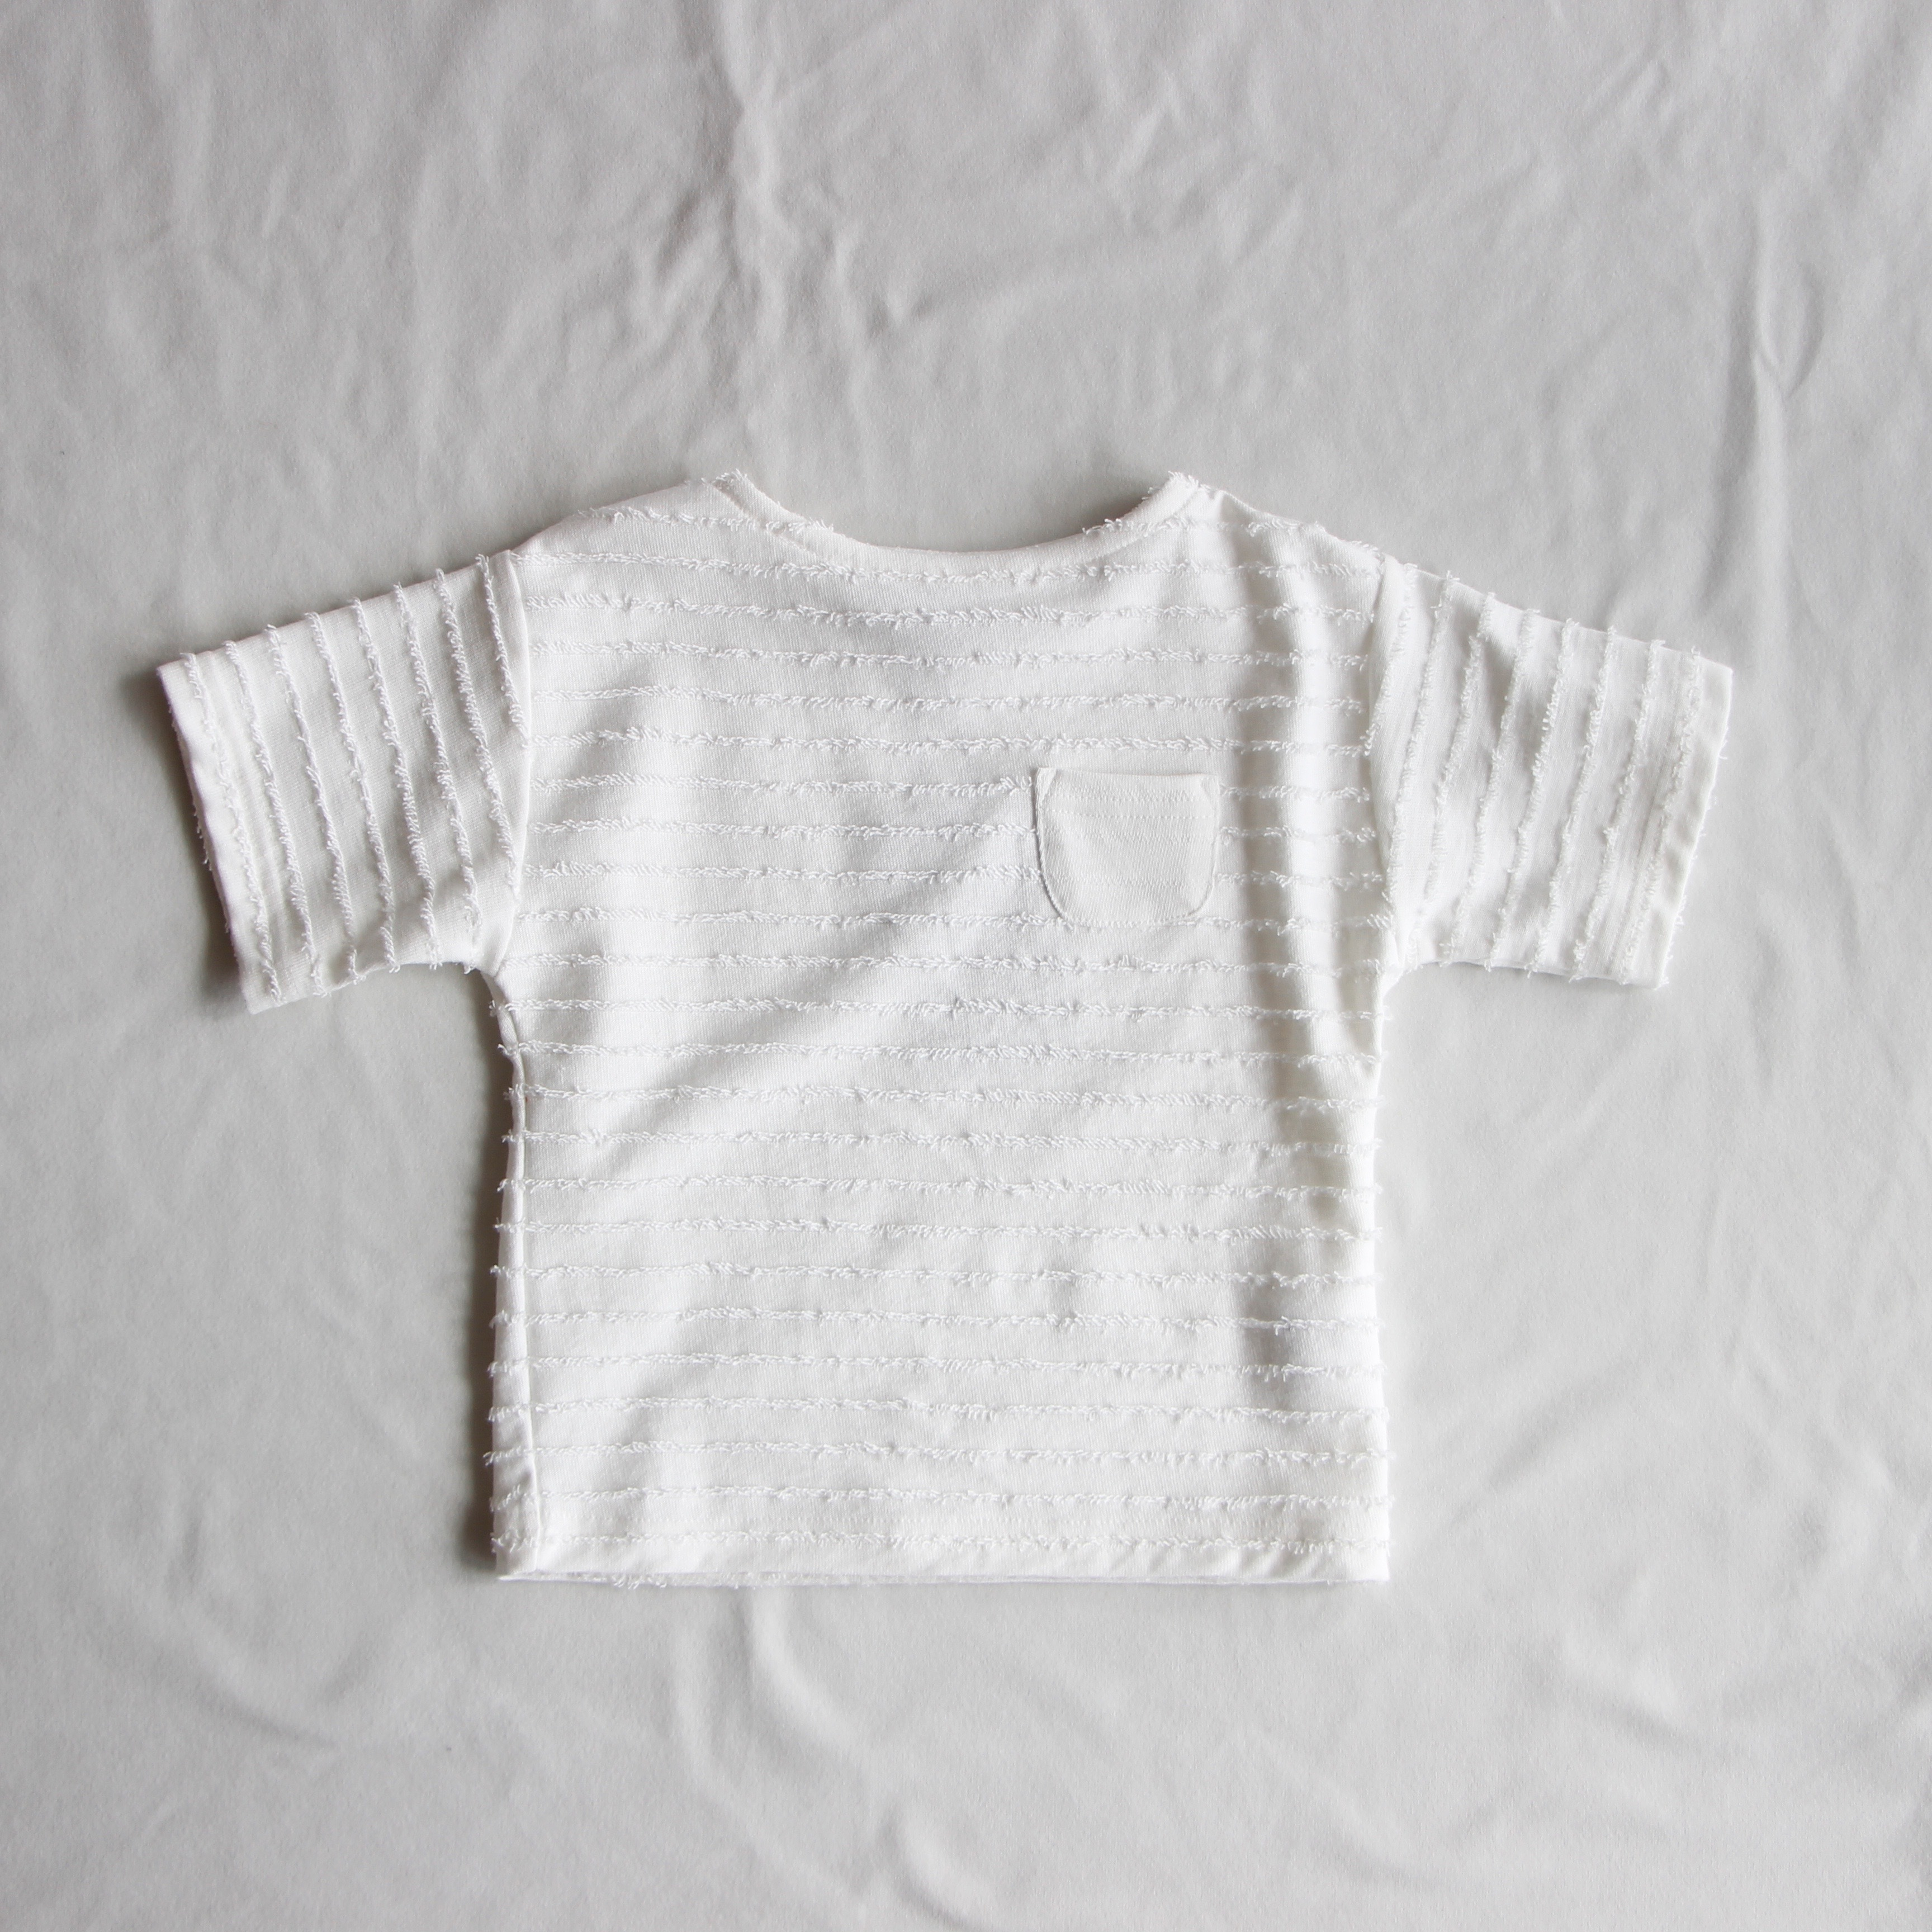 《mimi poupons 2017SS》ミニフリンジT-shirt / white